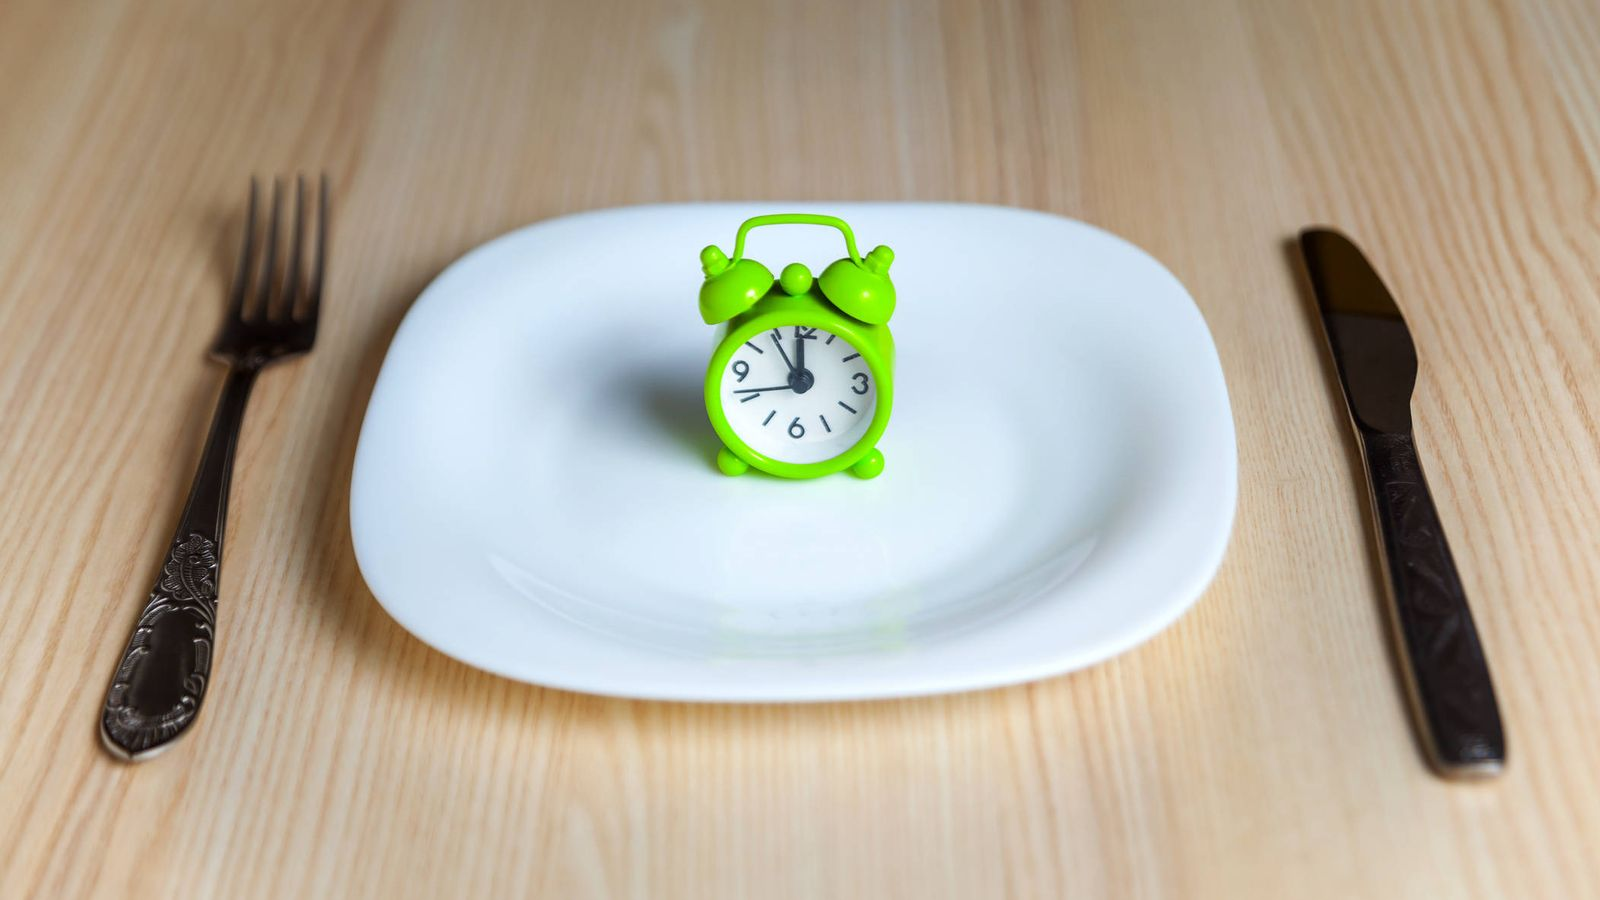 Foto: ¿Cuánto tengo que esperar para volver a comer? (iStock)